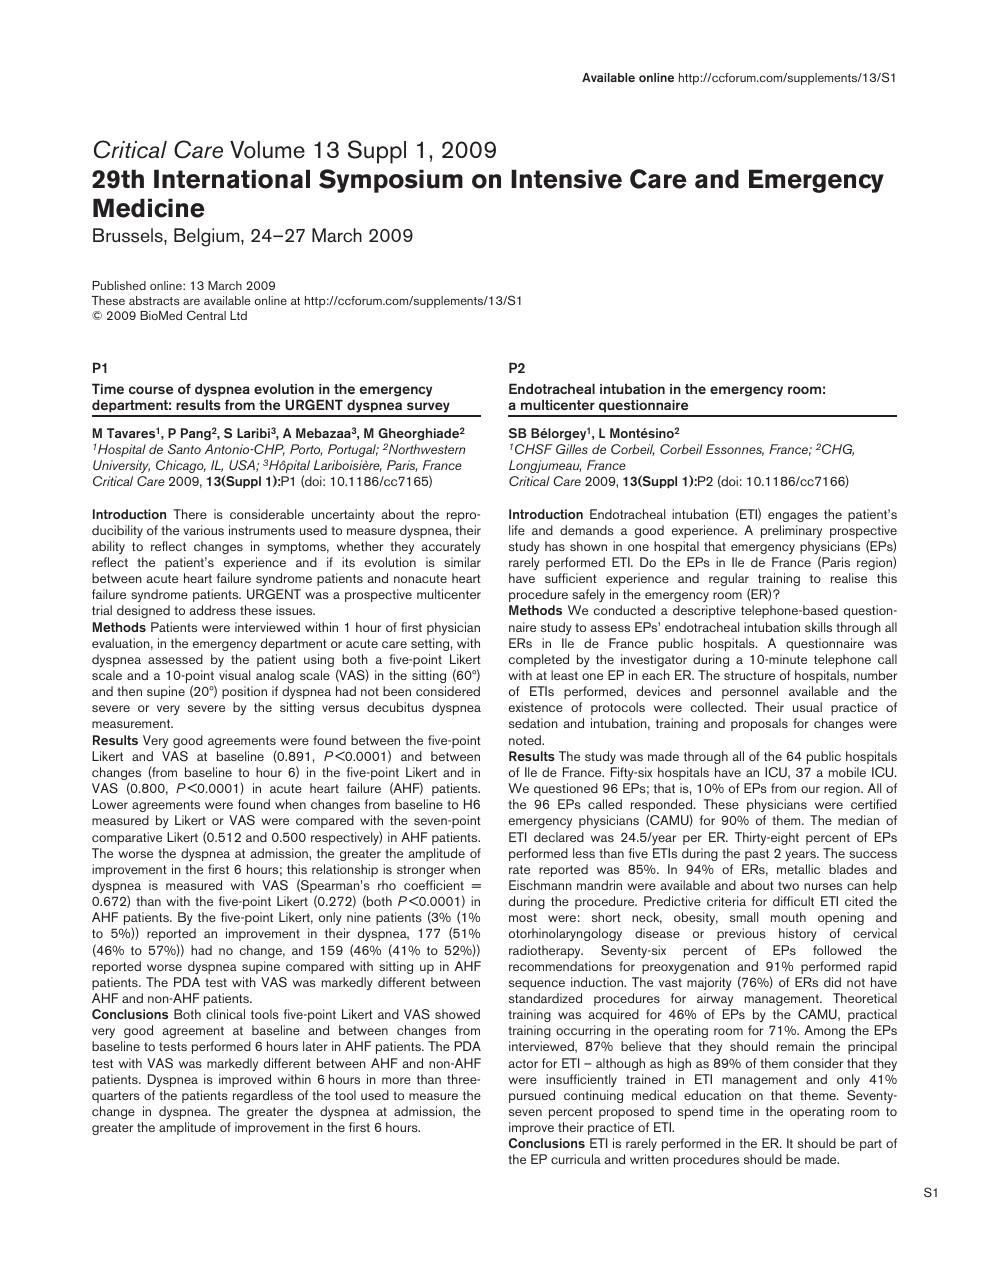 Dimethyl sulphoxide administration decreases renal ischemic